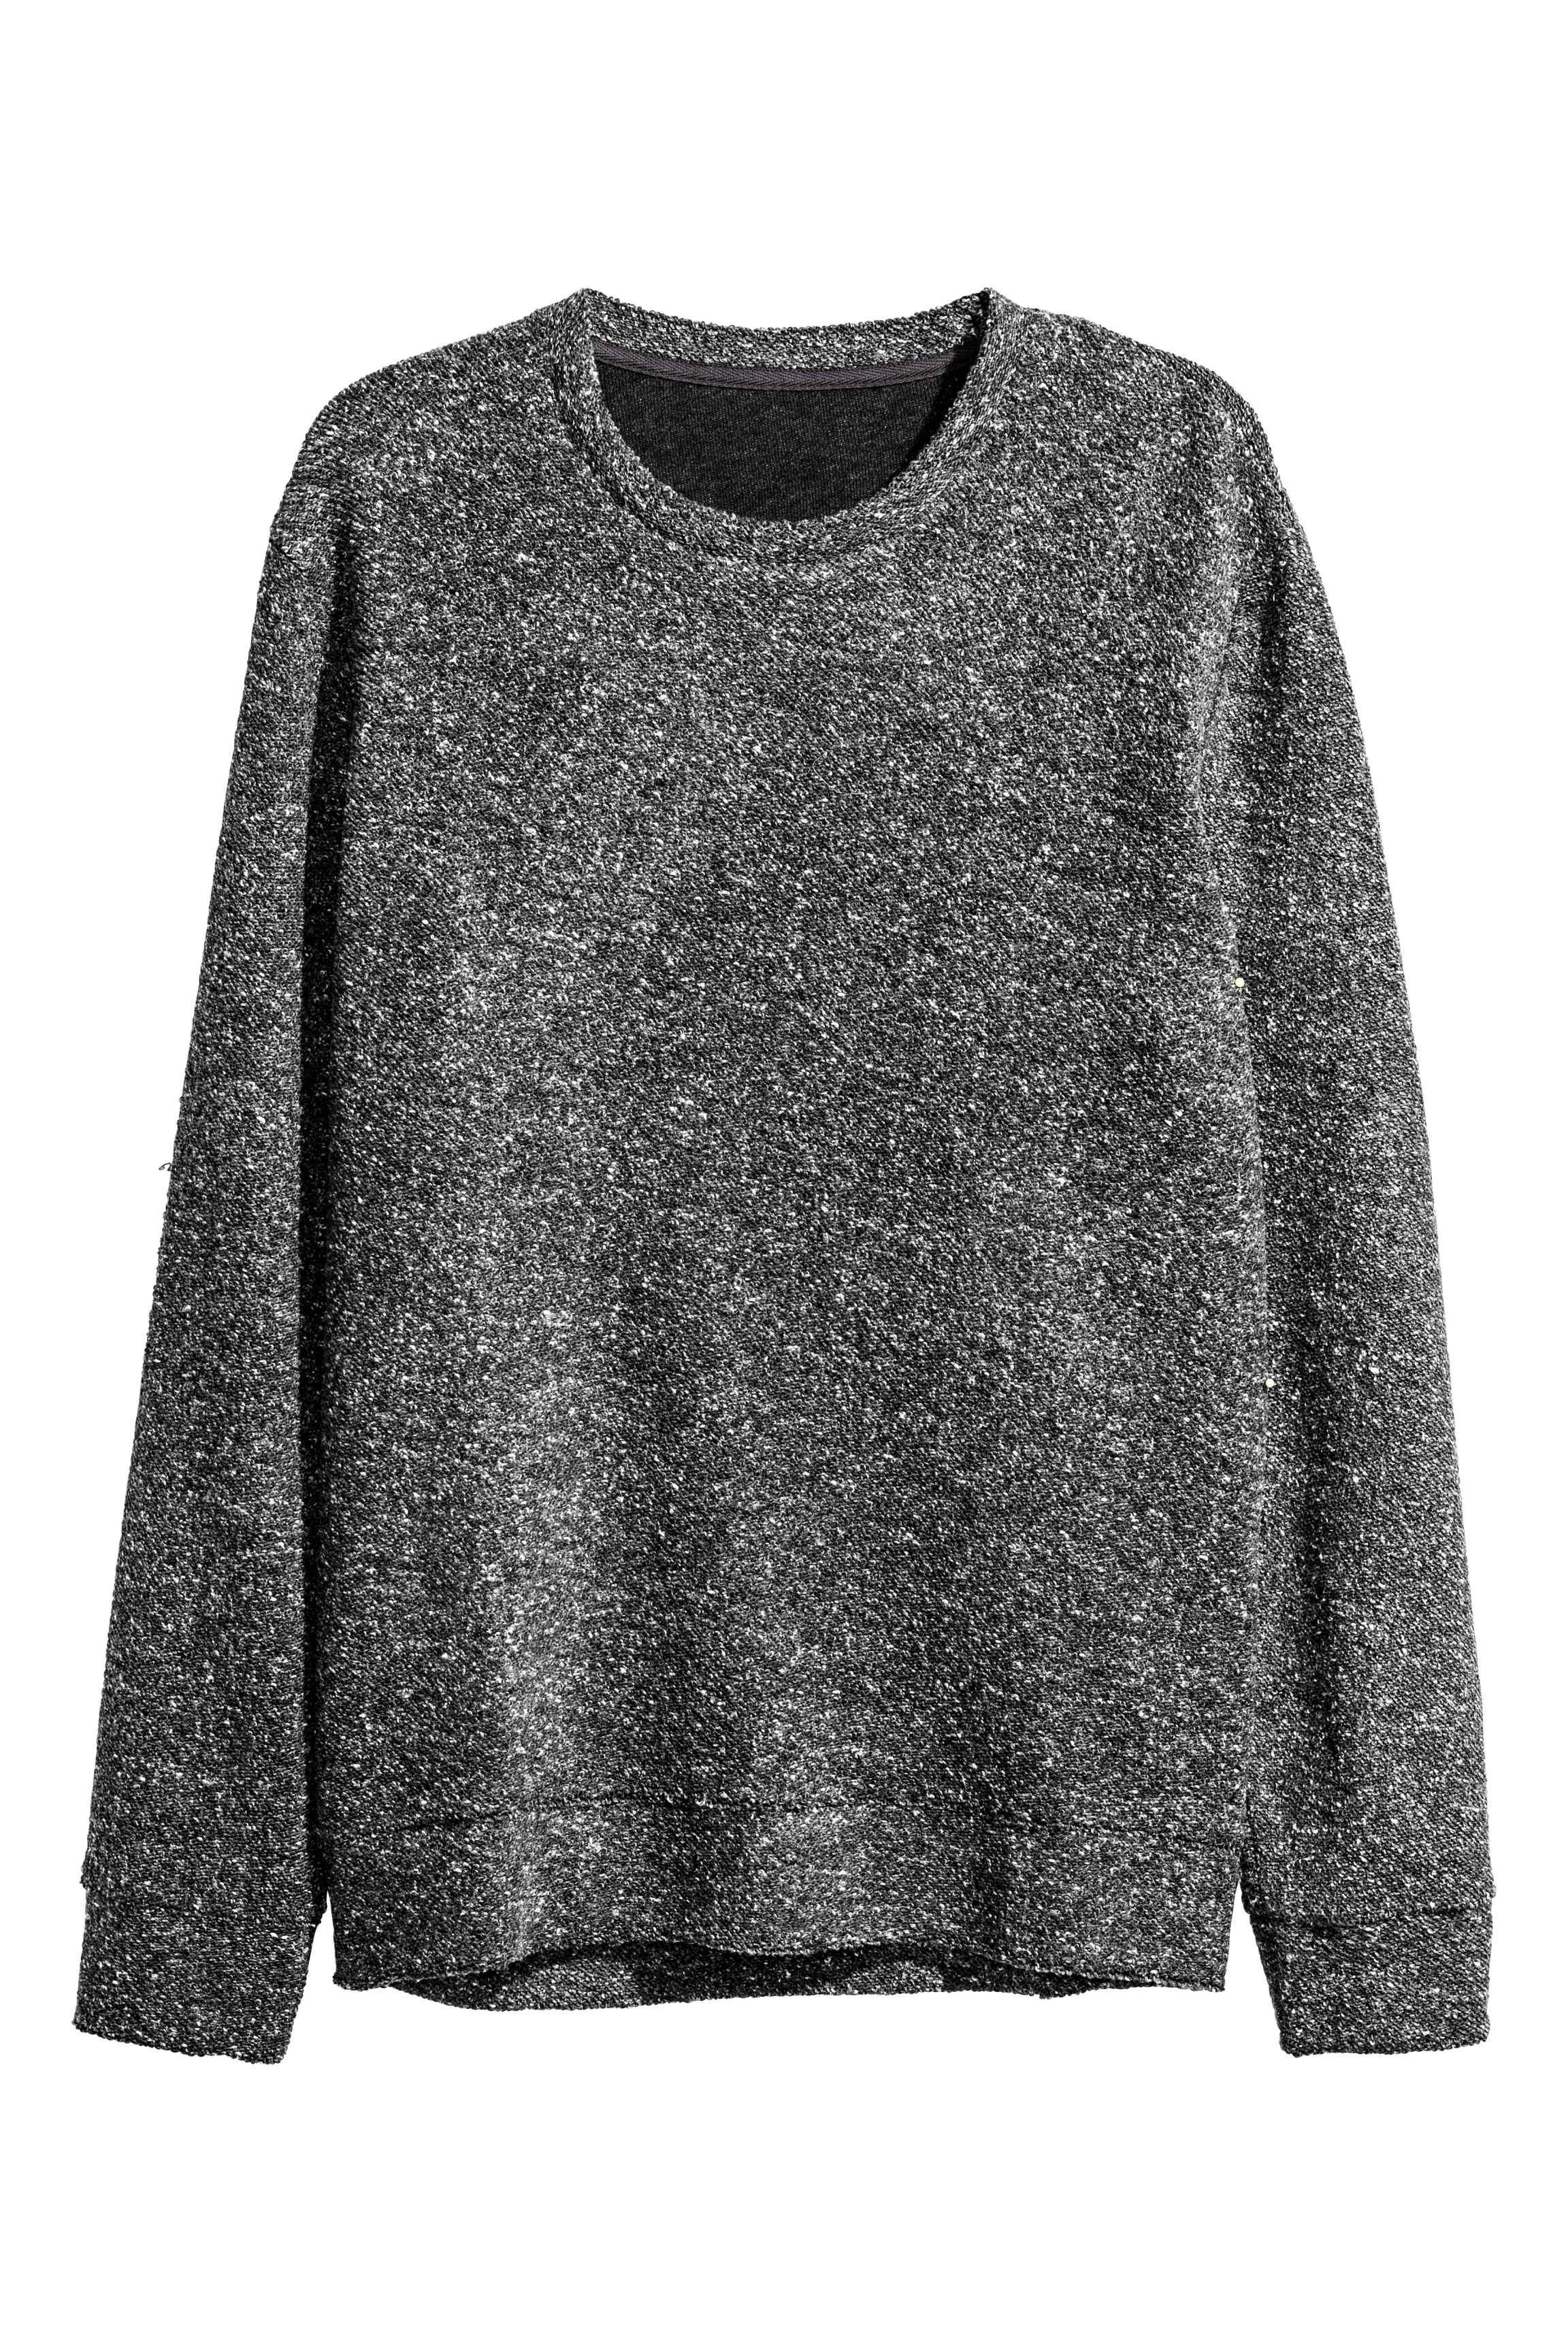 Sweatshirt, £19.90 ( hm.com )